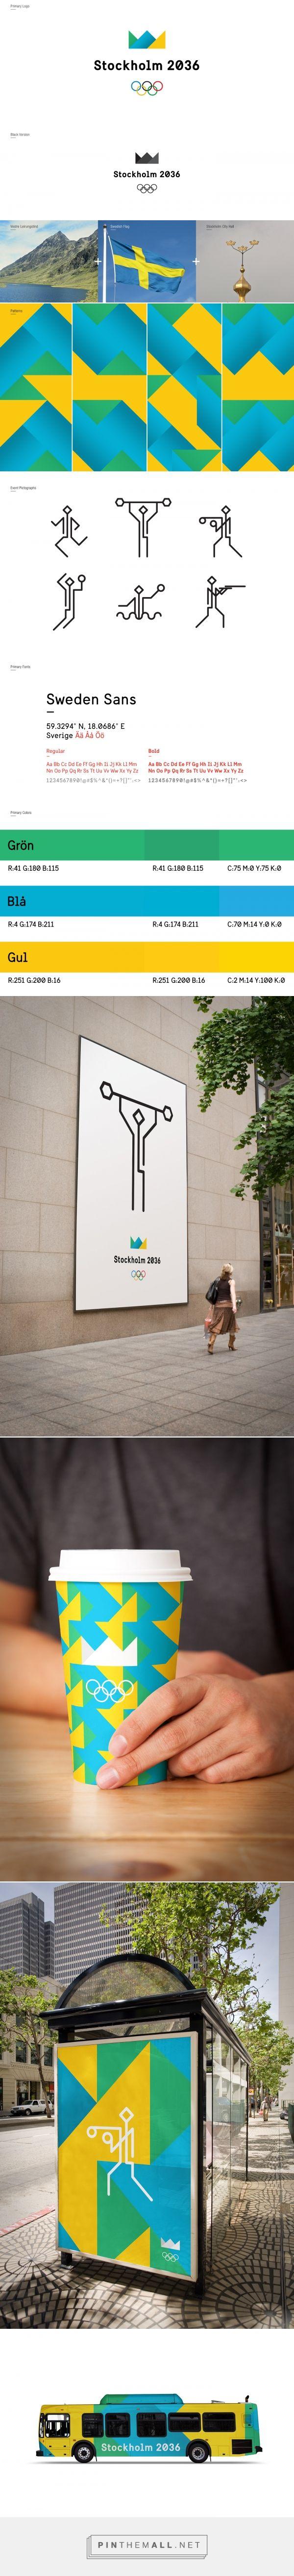 Stockholm Olympics 2036 on Behance - created via http://pinthemall.net